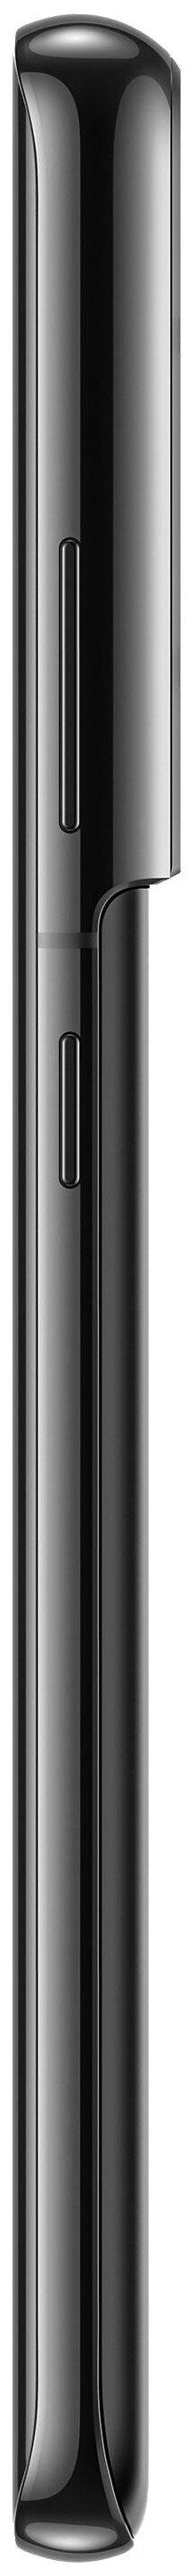 Samsung Galaxy S21 Ultra 5G 12/128GB - операционная система: Android 11